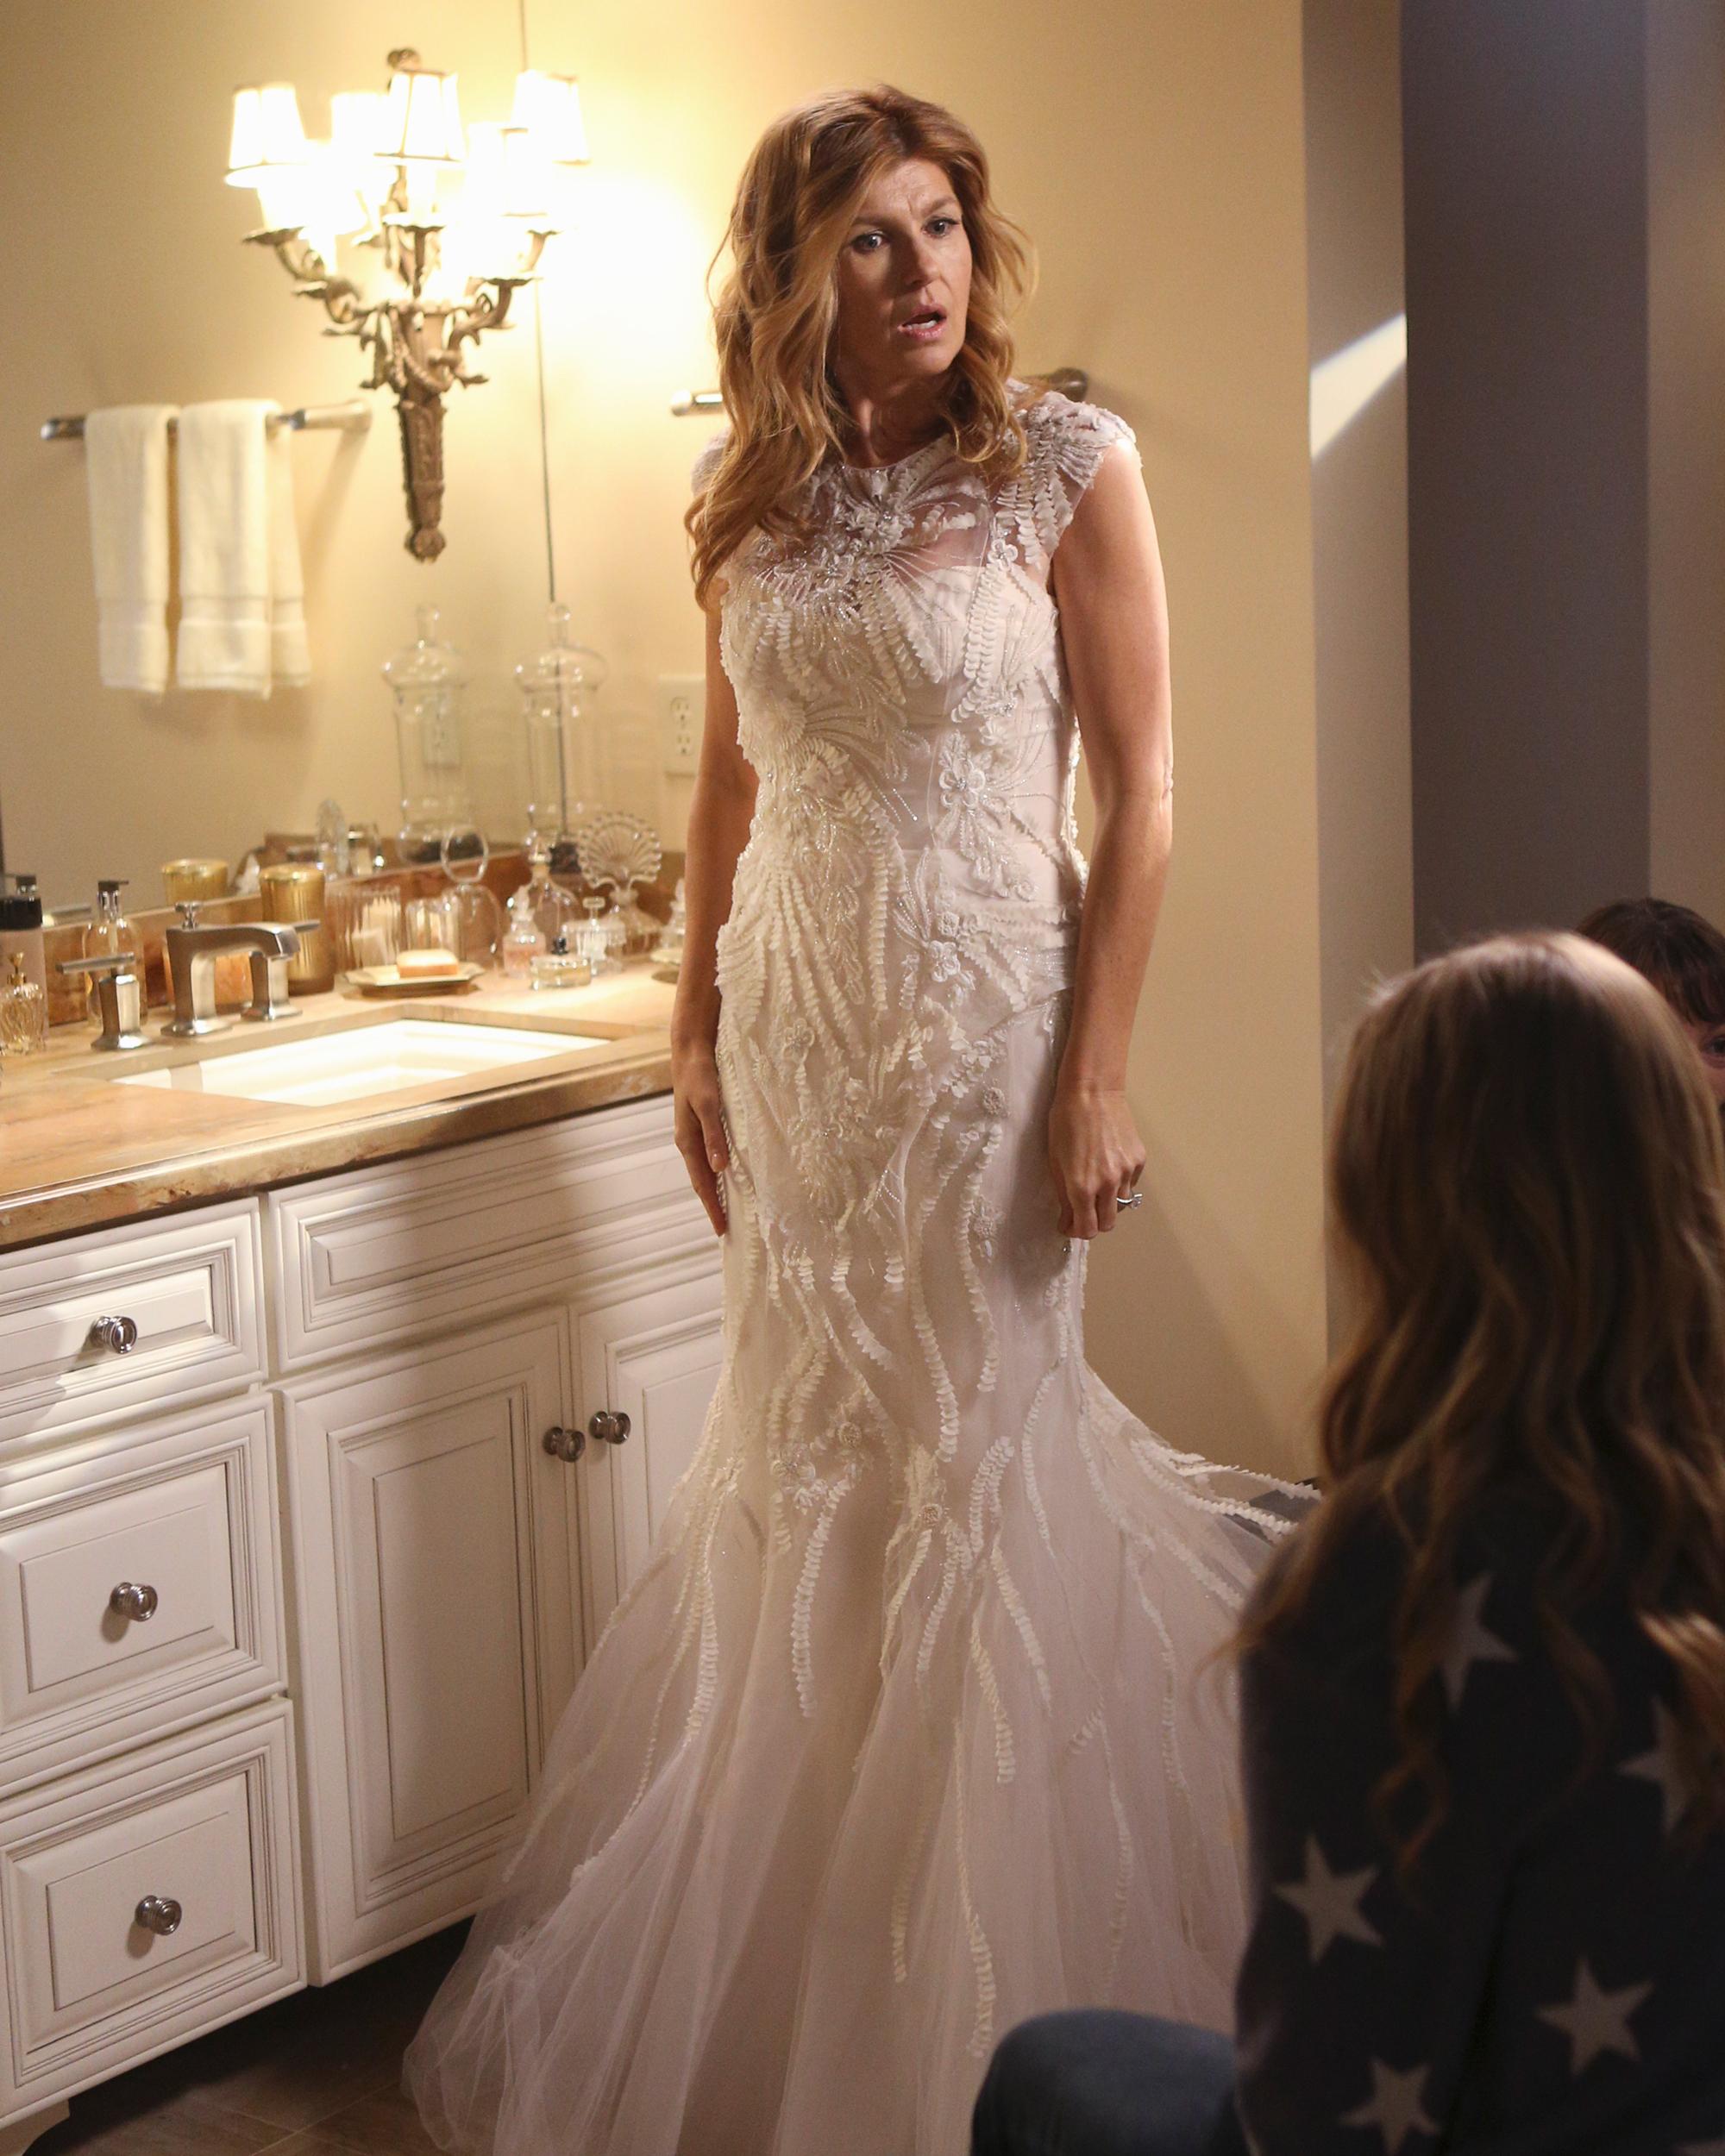 tv-wedding-dresses-nashville-wedding-rayna-1115.jpg